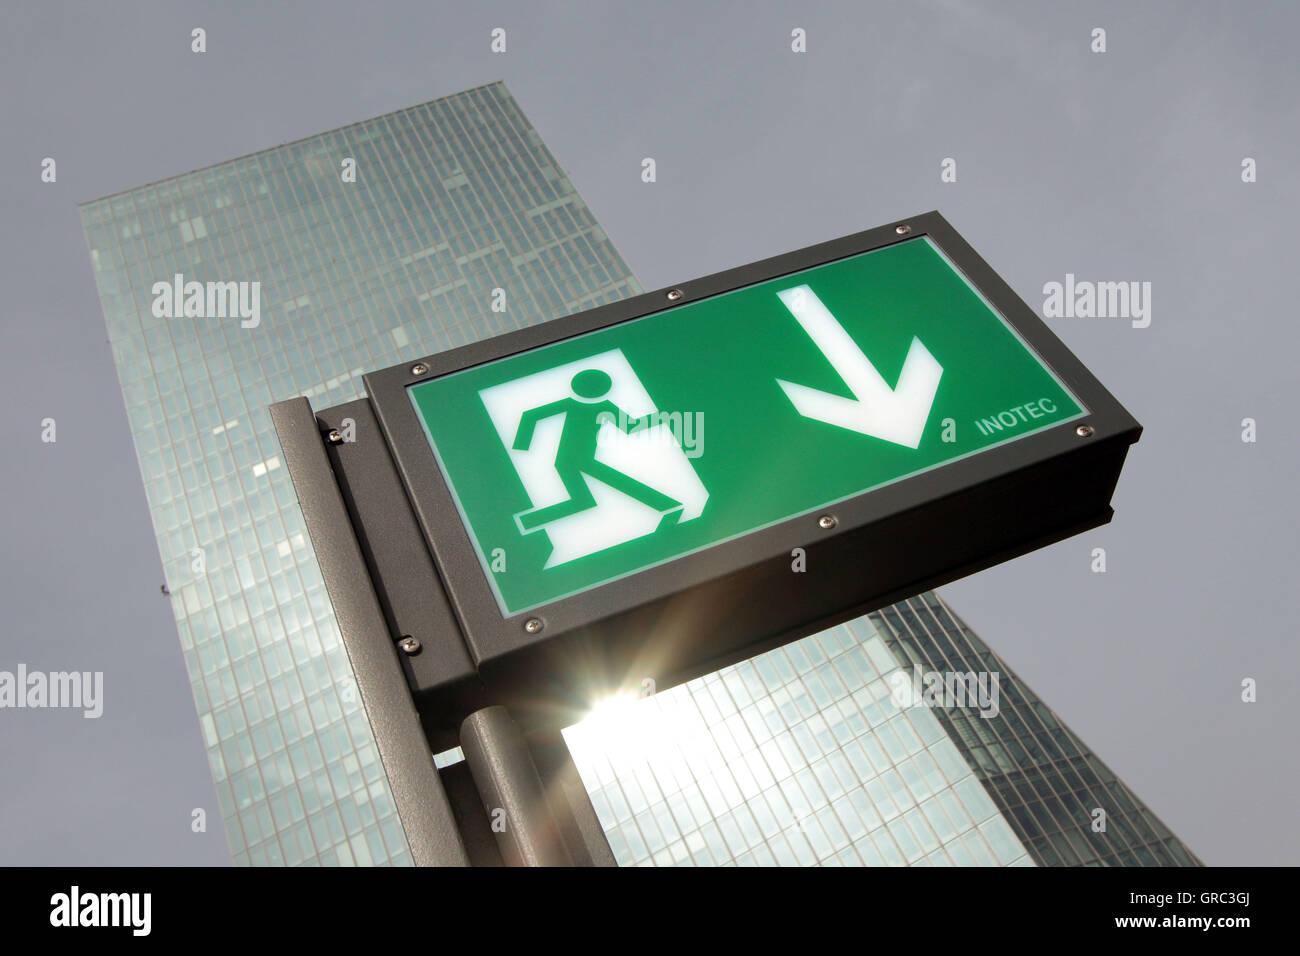 Notfall Ext Schild mit EZB-Europäische Zentralbank-Hochhaus Stockbild